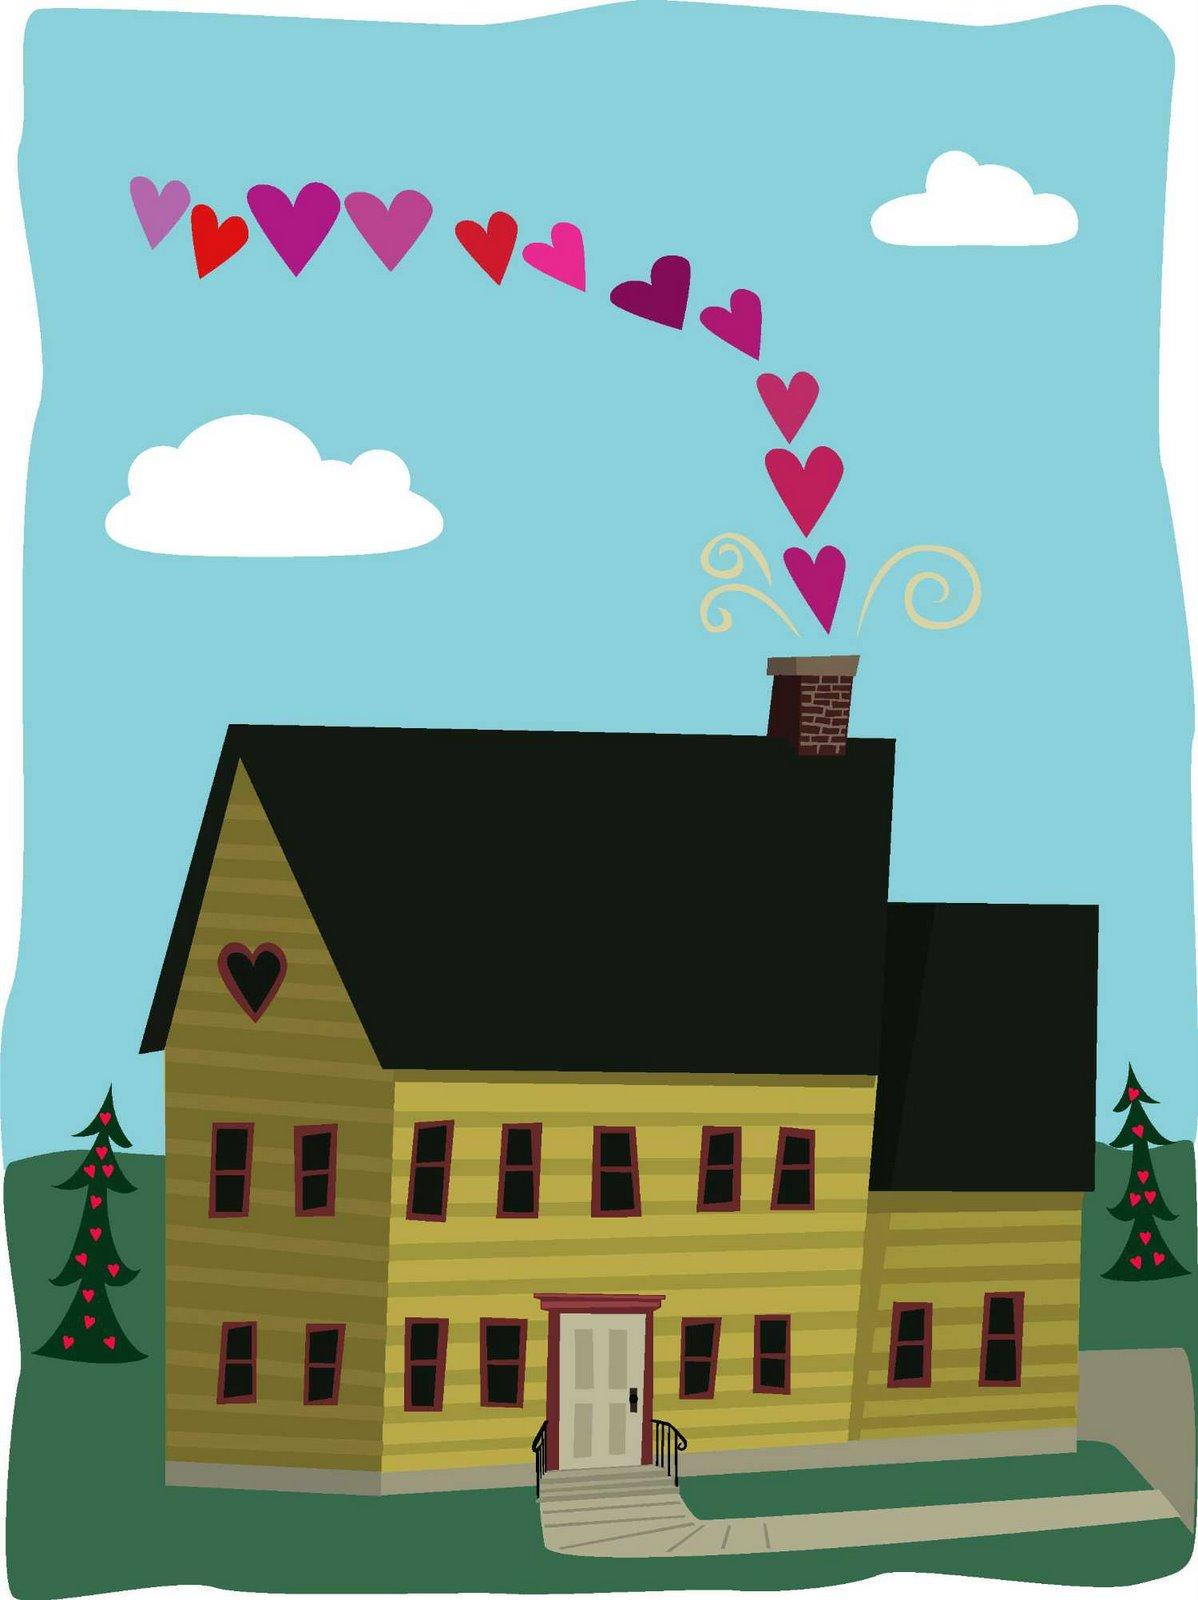 [heart+house]